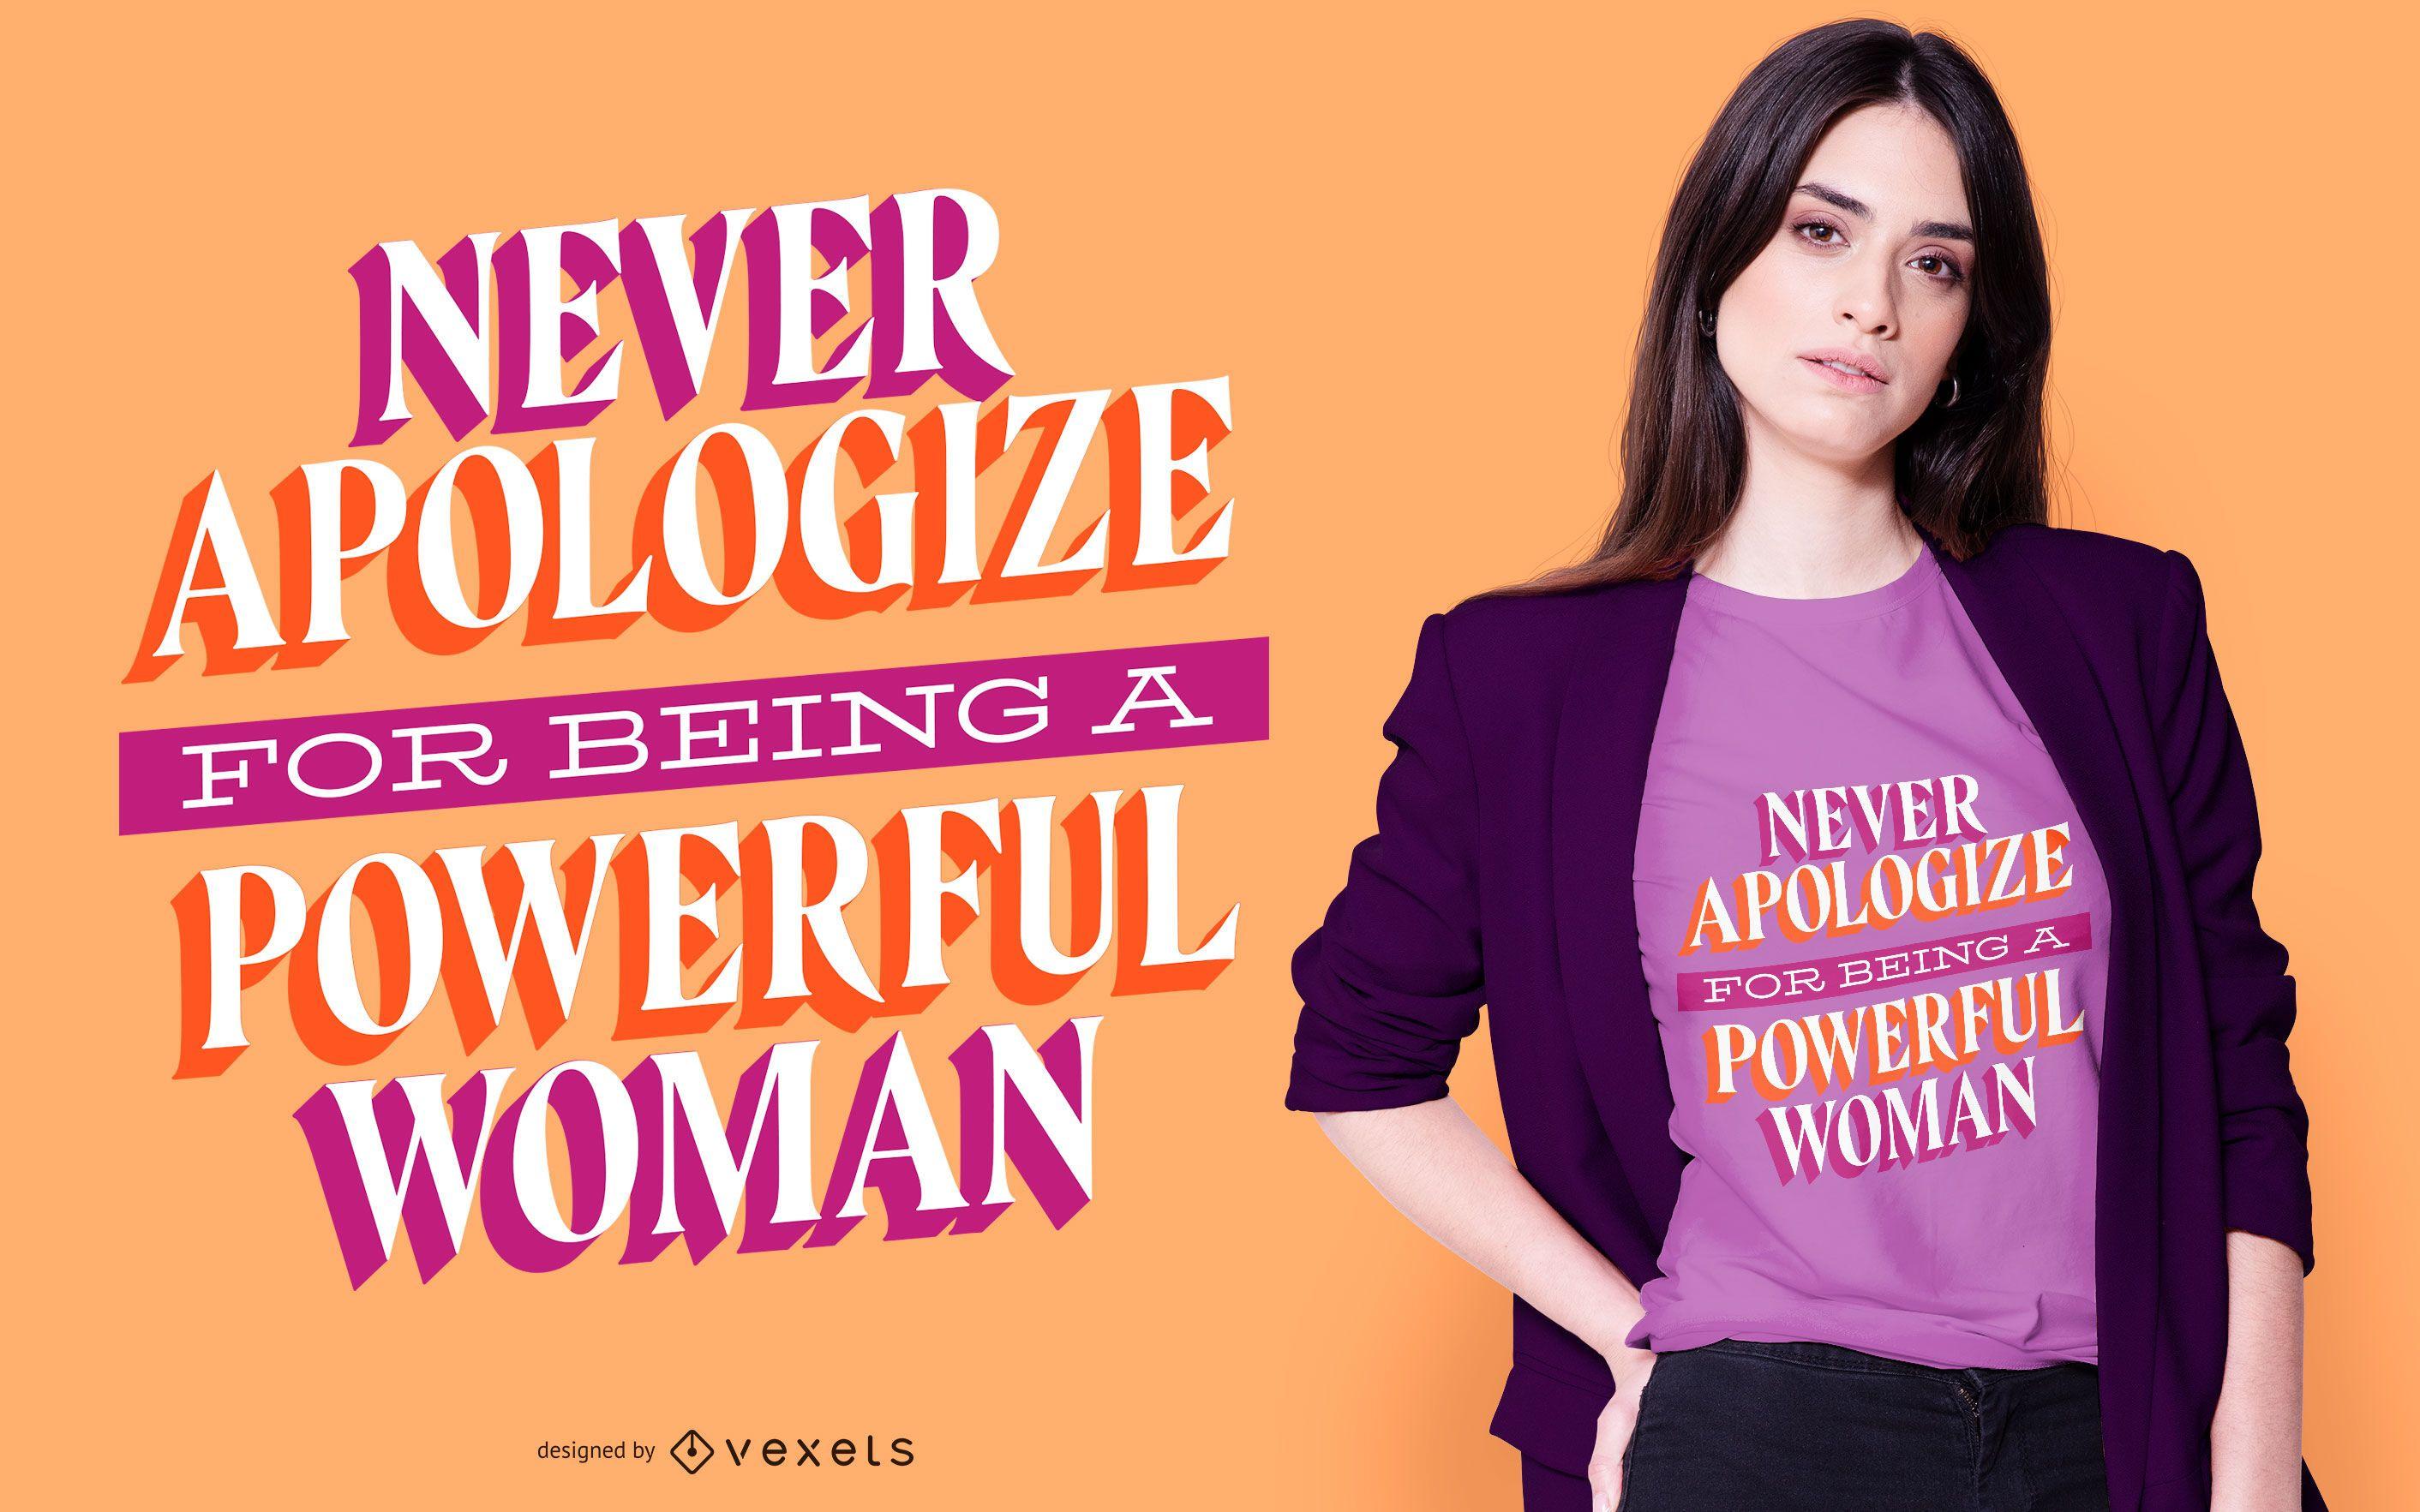 Powerful woman t-shirt design